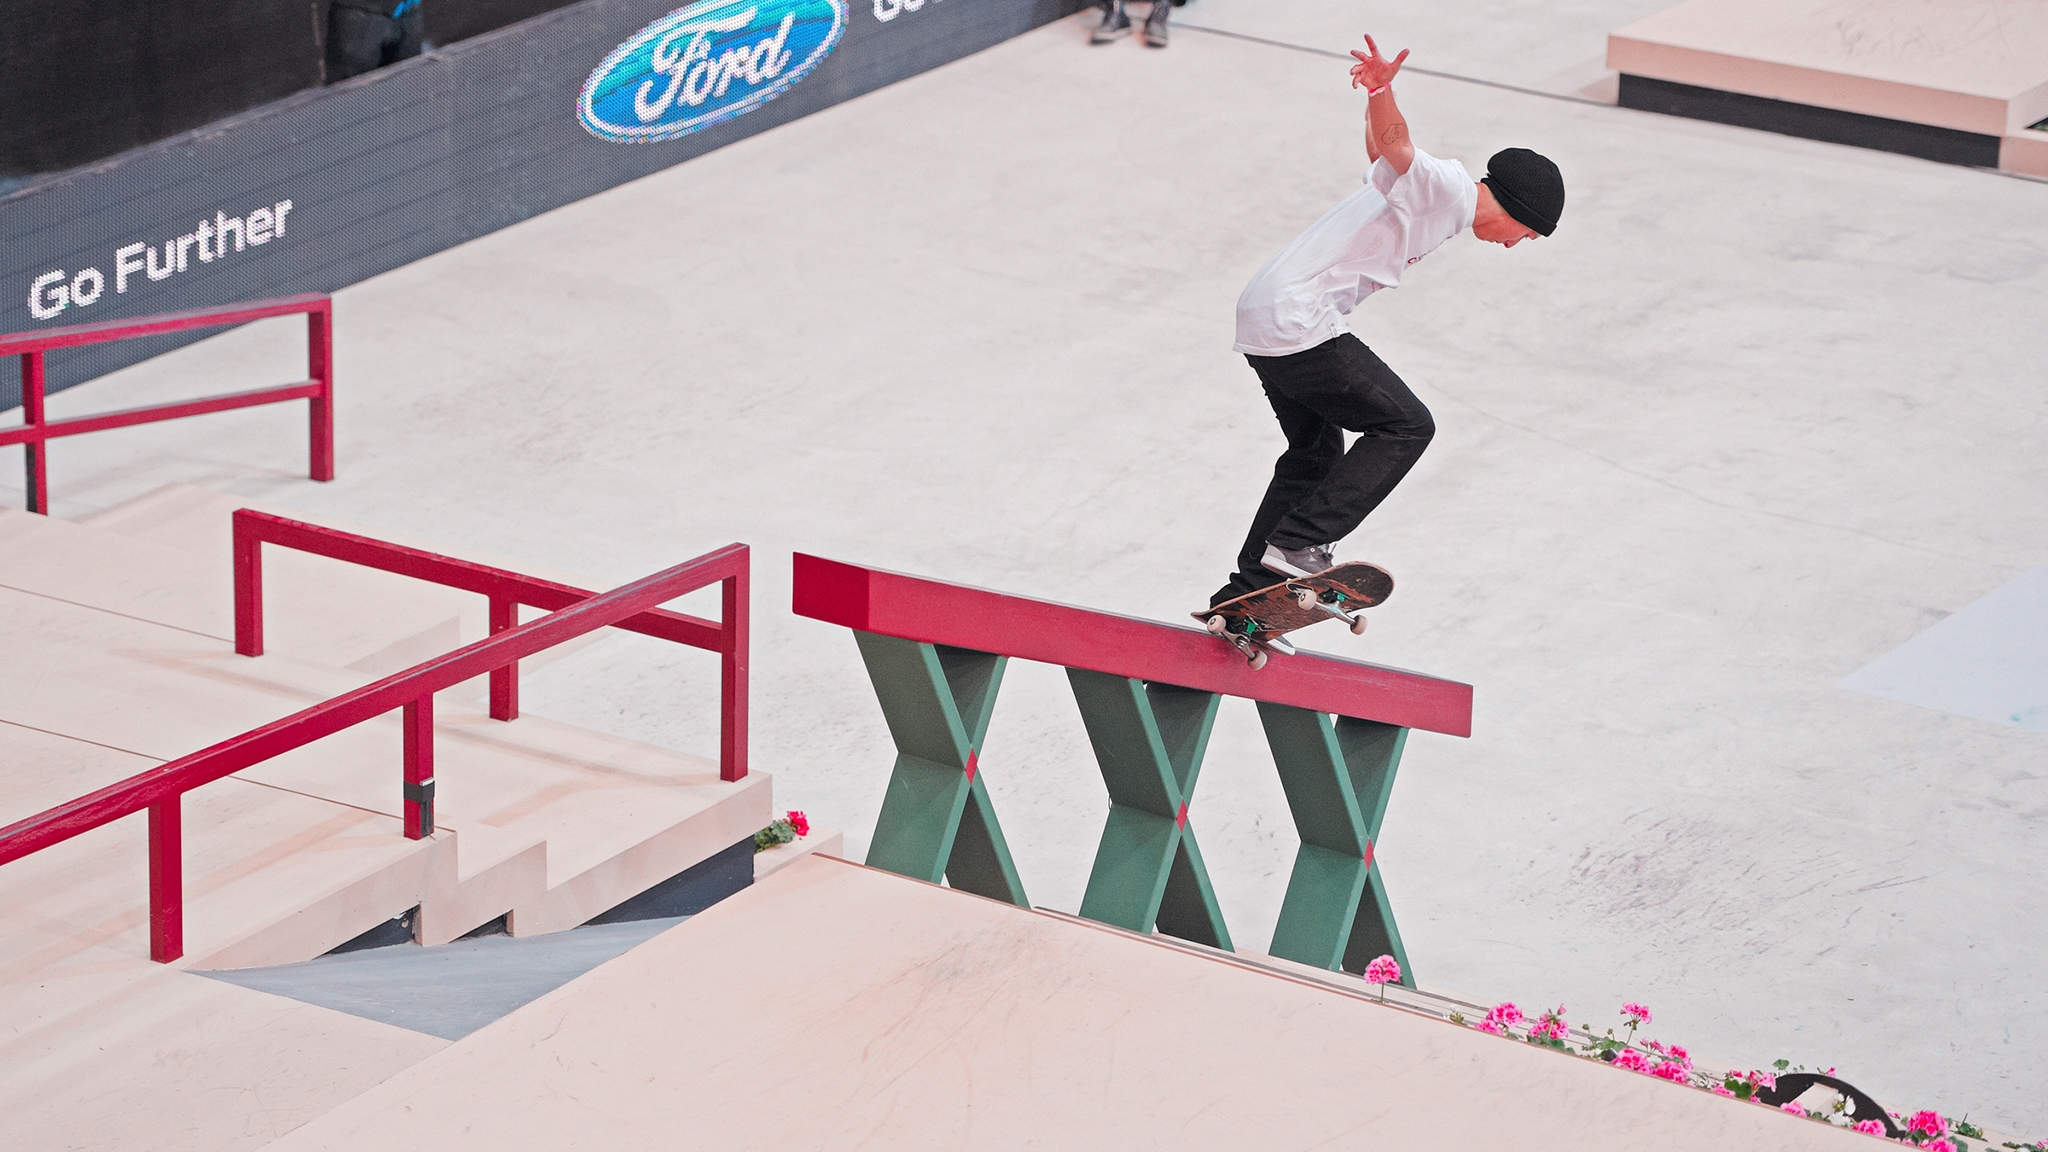 Skateboarder Tom Asta